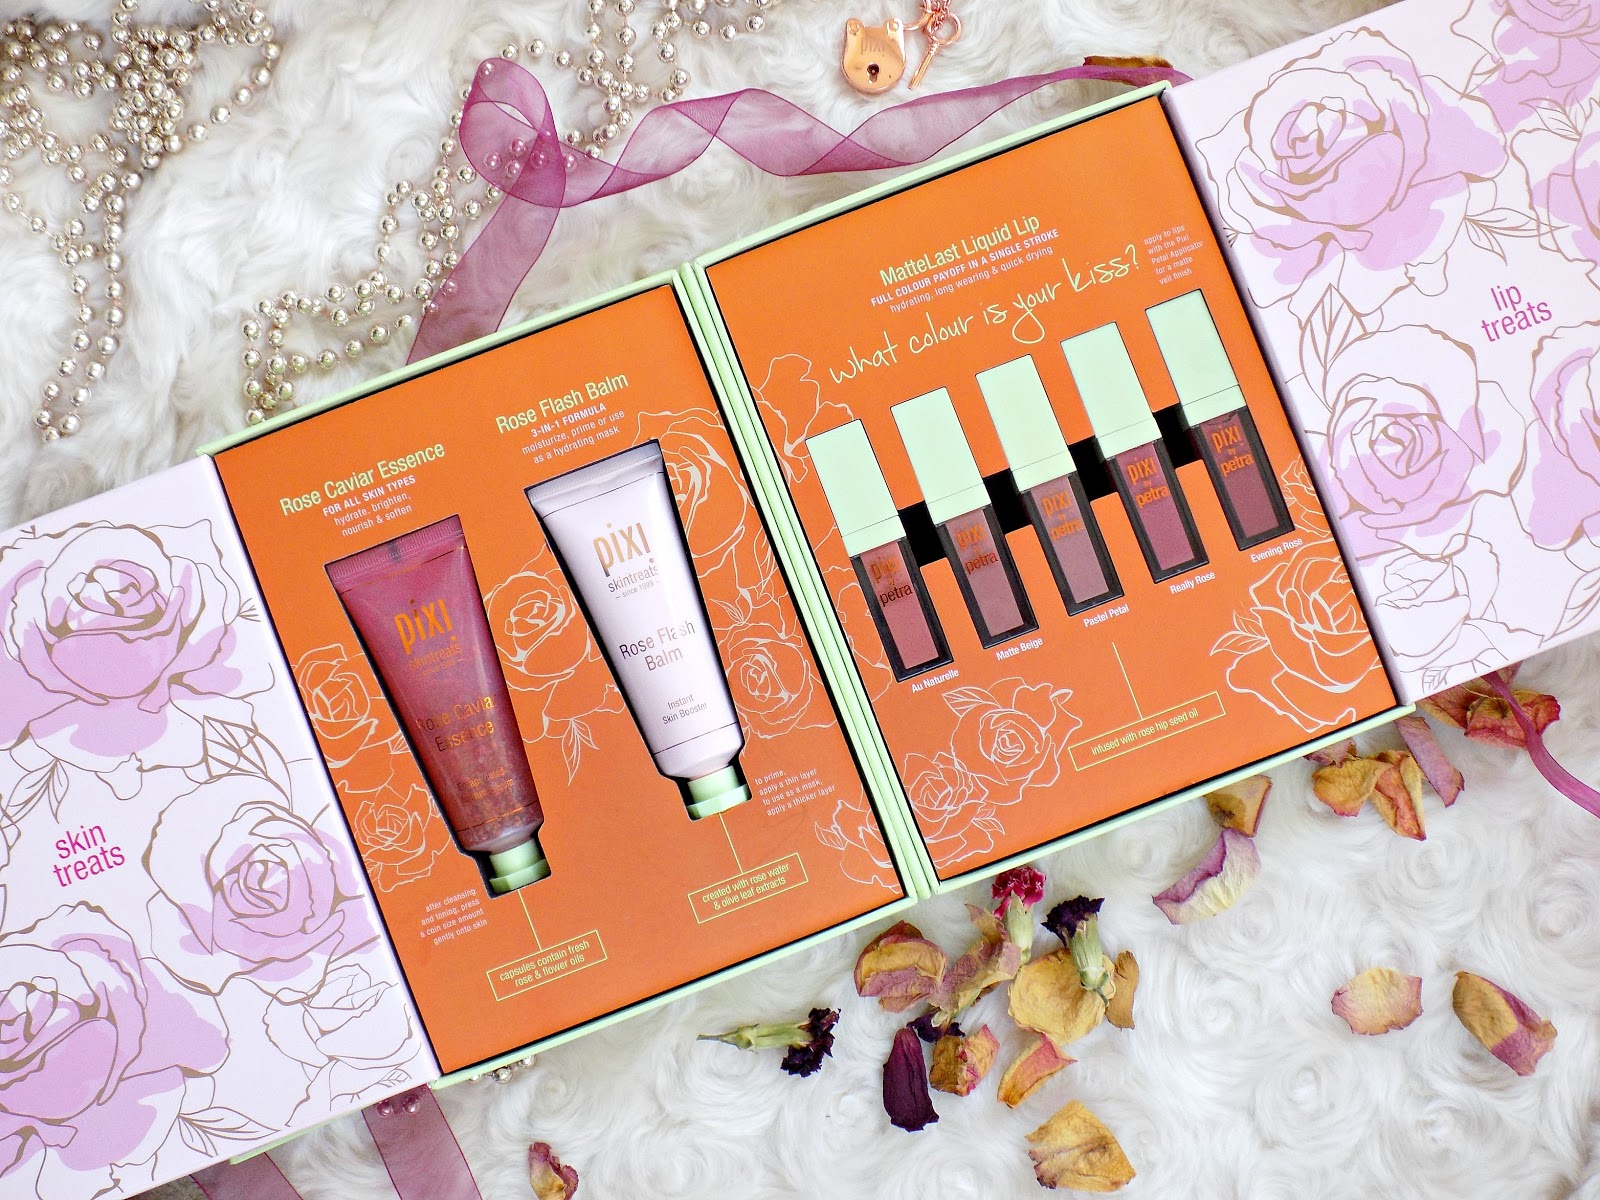 Pixi PR package, rose skin and lip treats